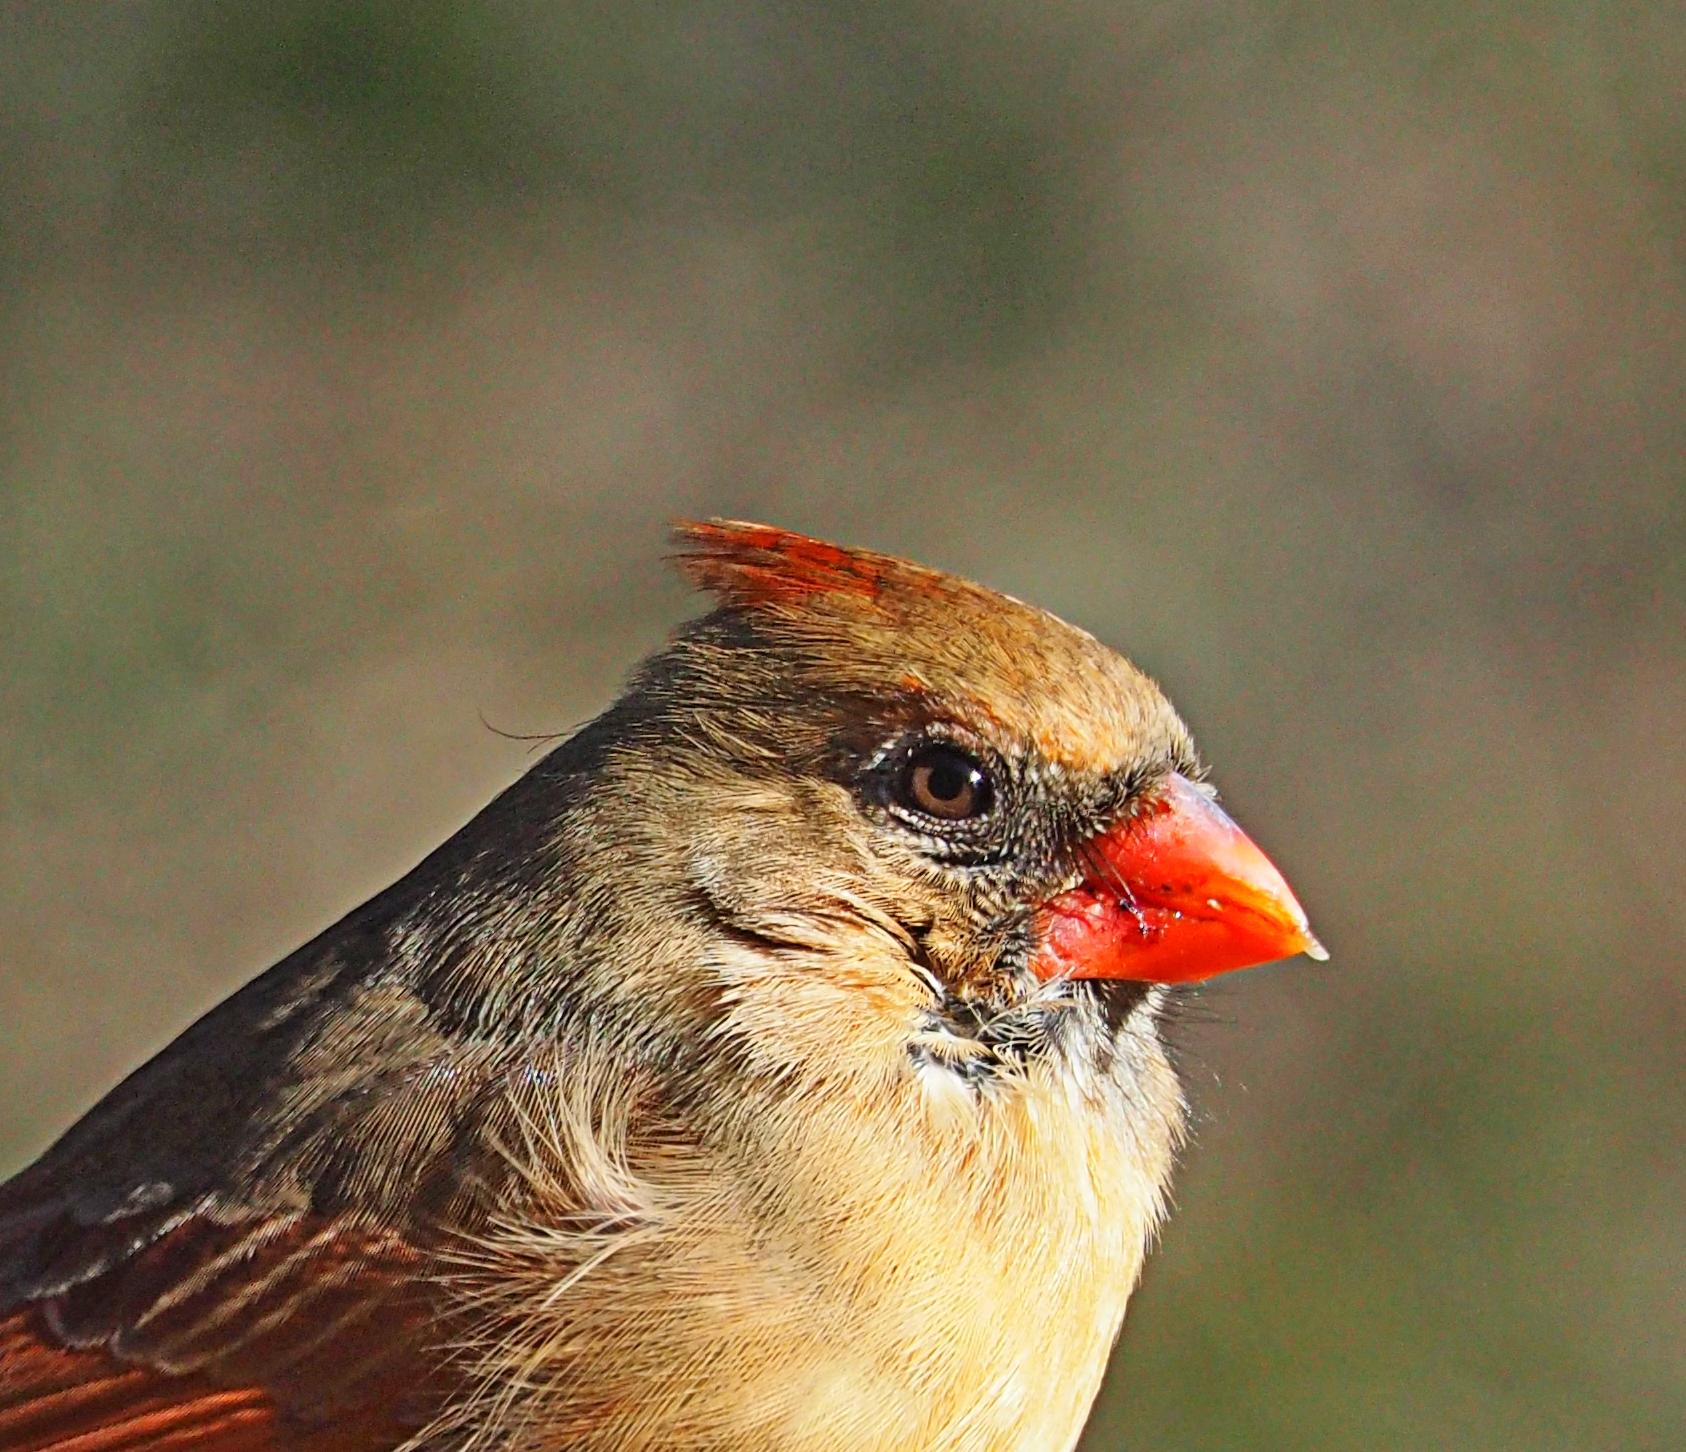 Female cardinal up close